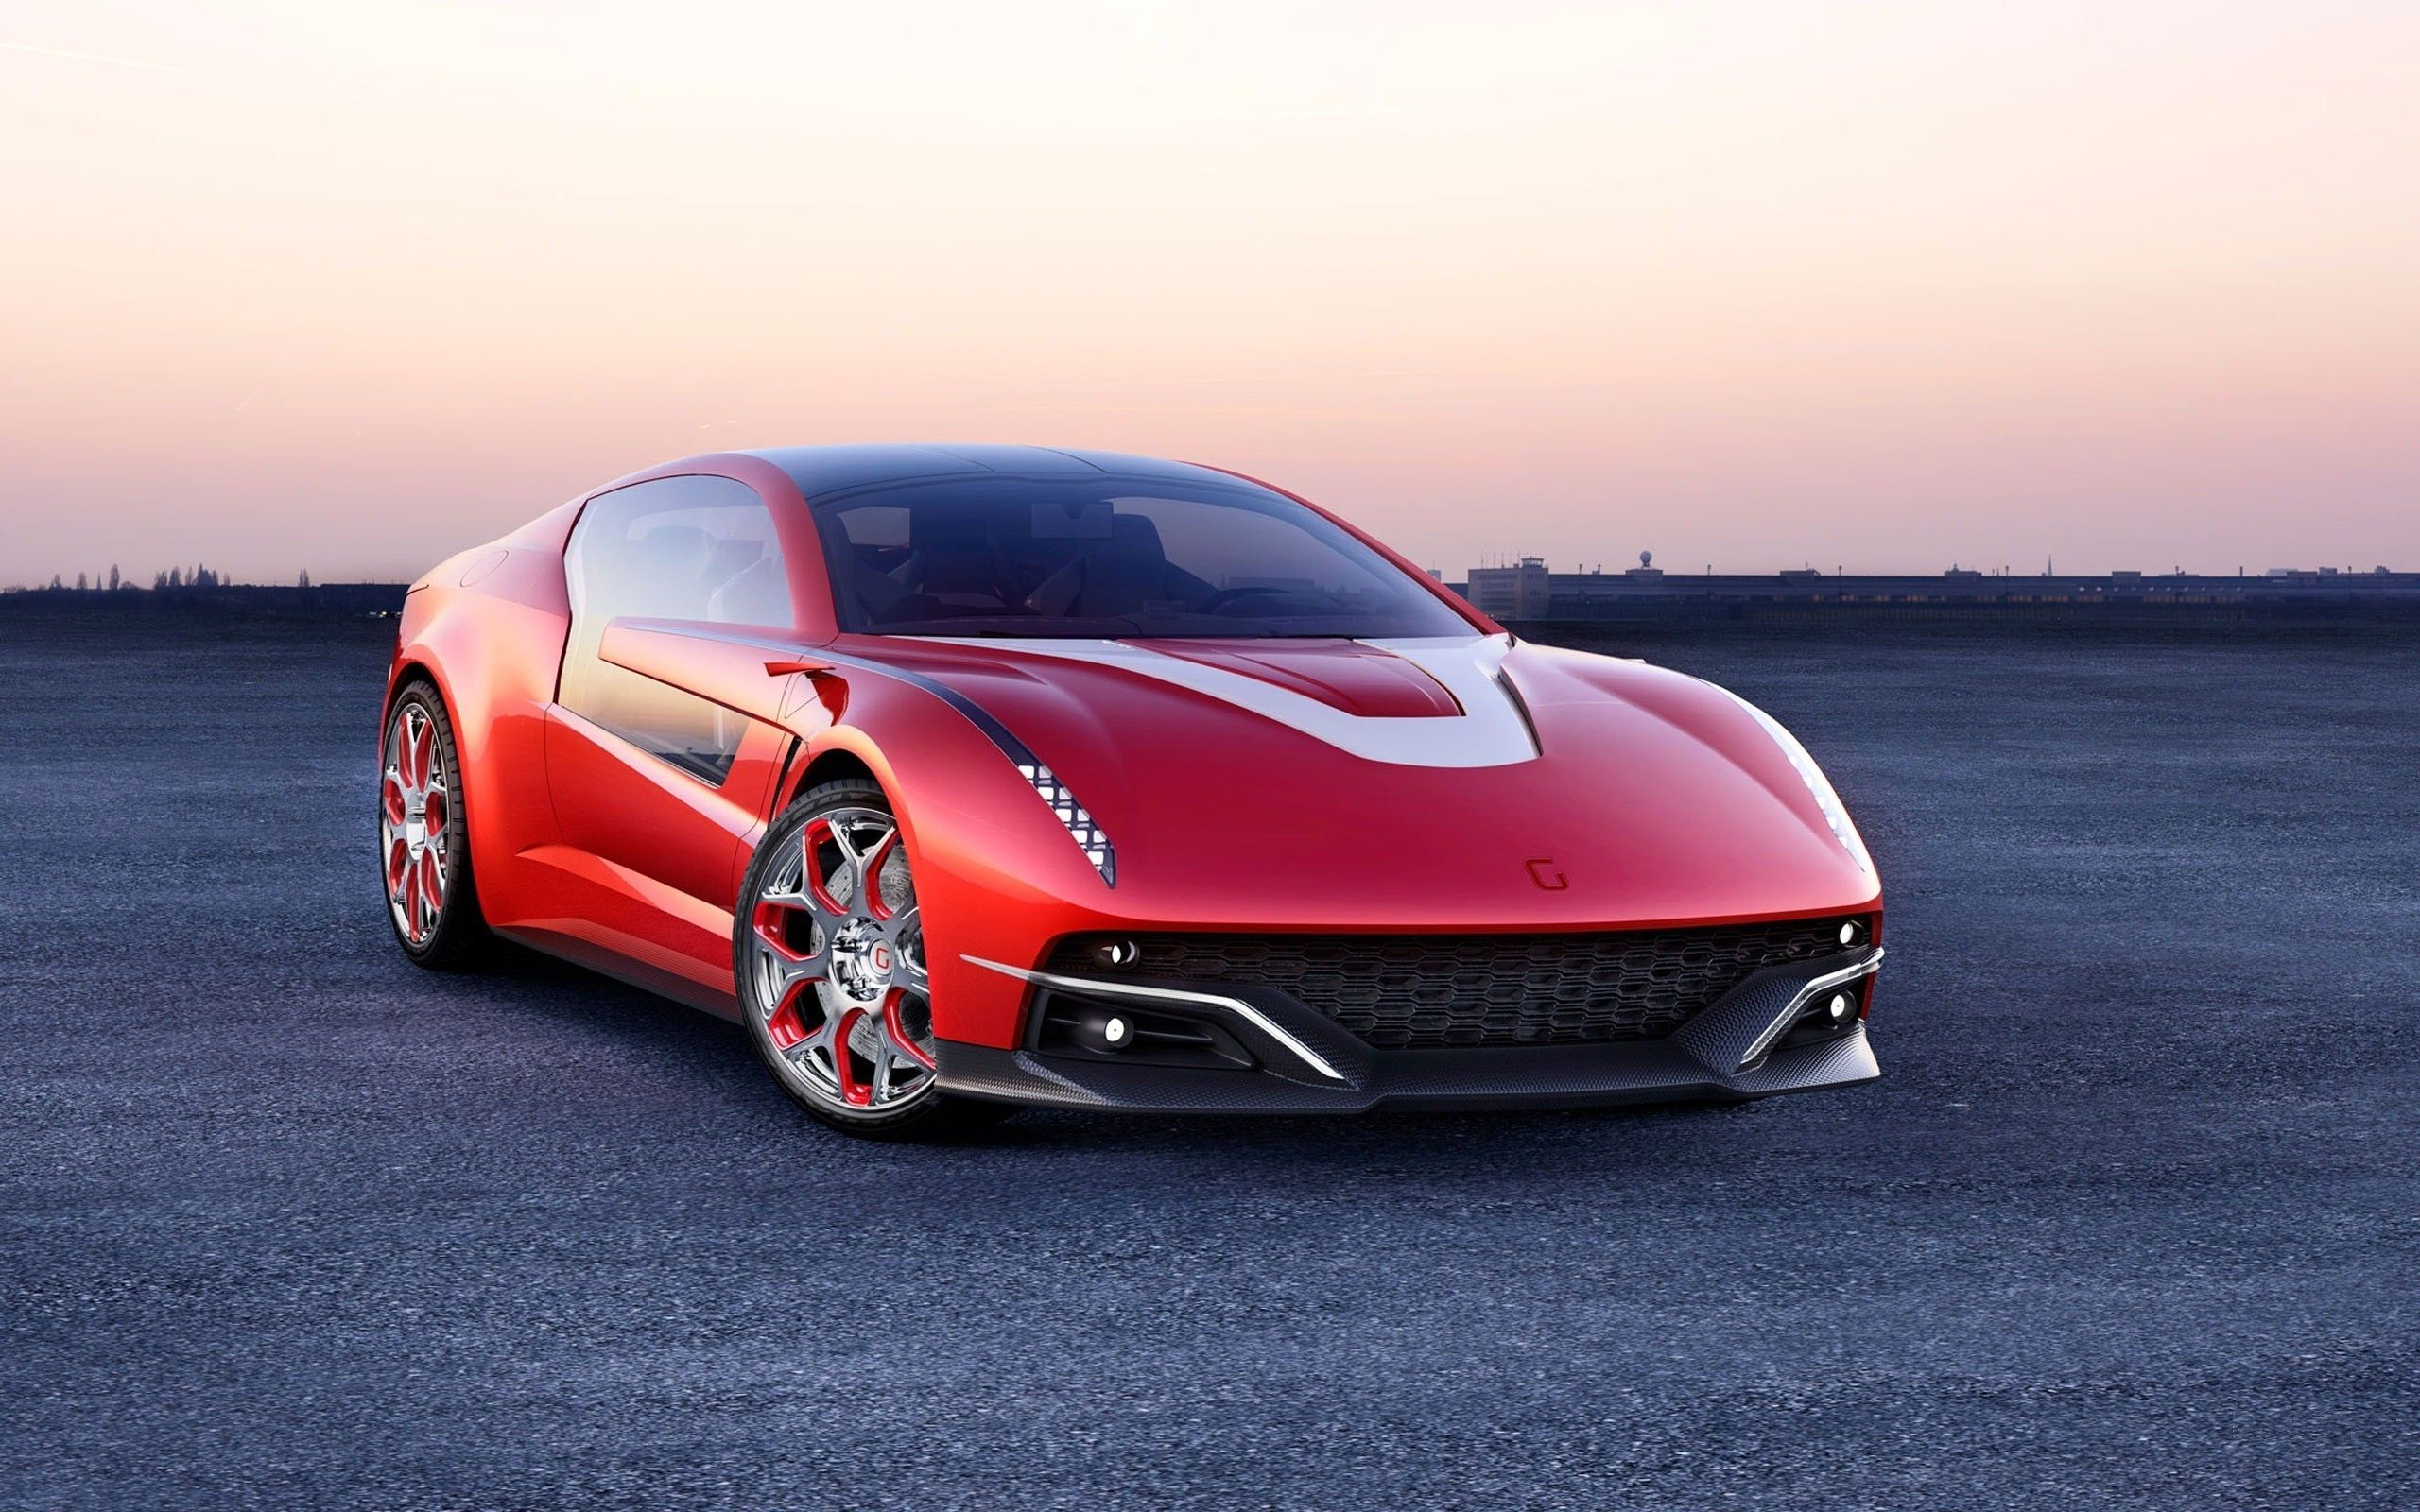 Italdesign giugiaro brivido concept car wallpaper hd http imashon com